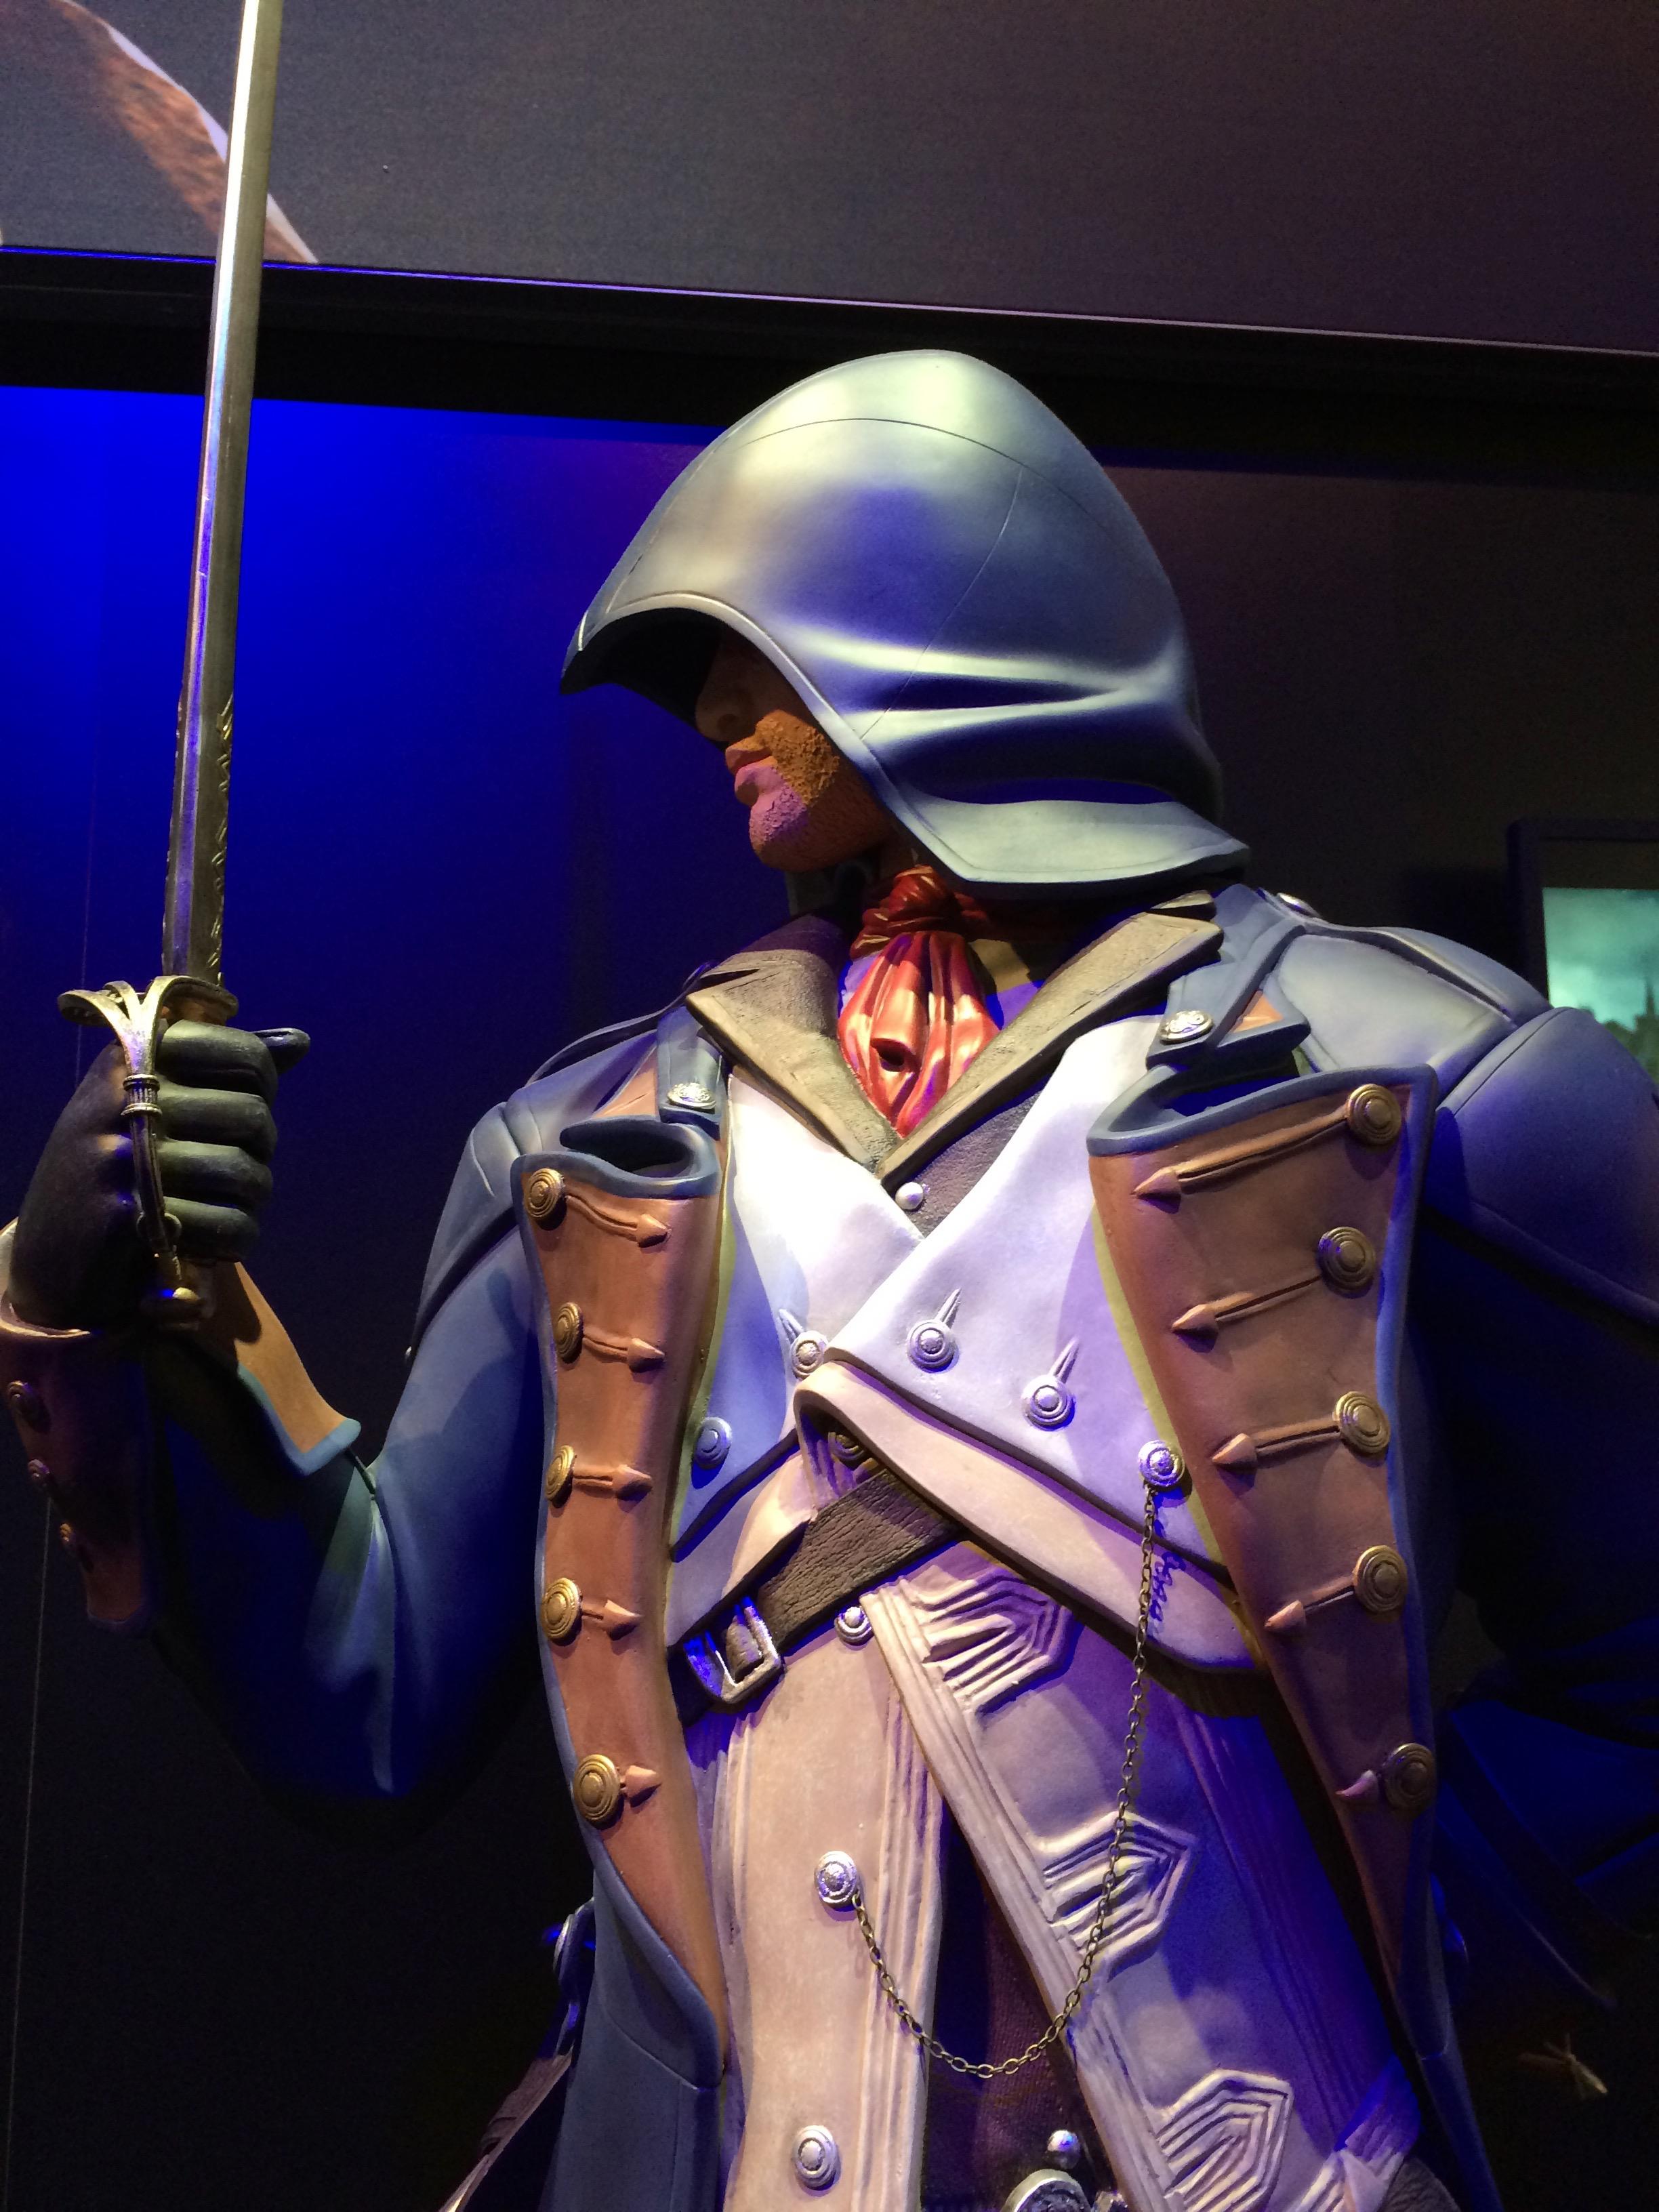 Arno Dorian life-sized statue